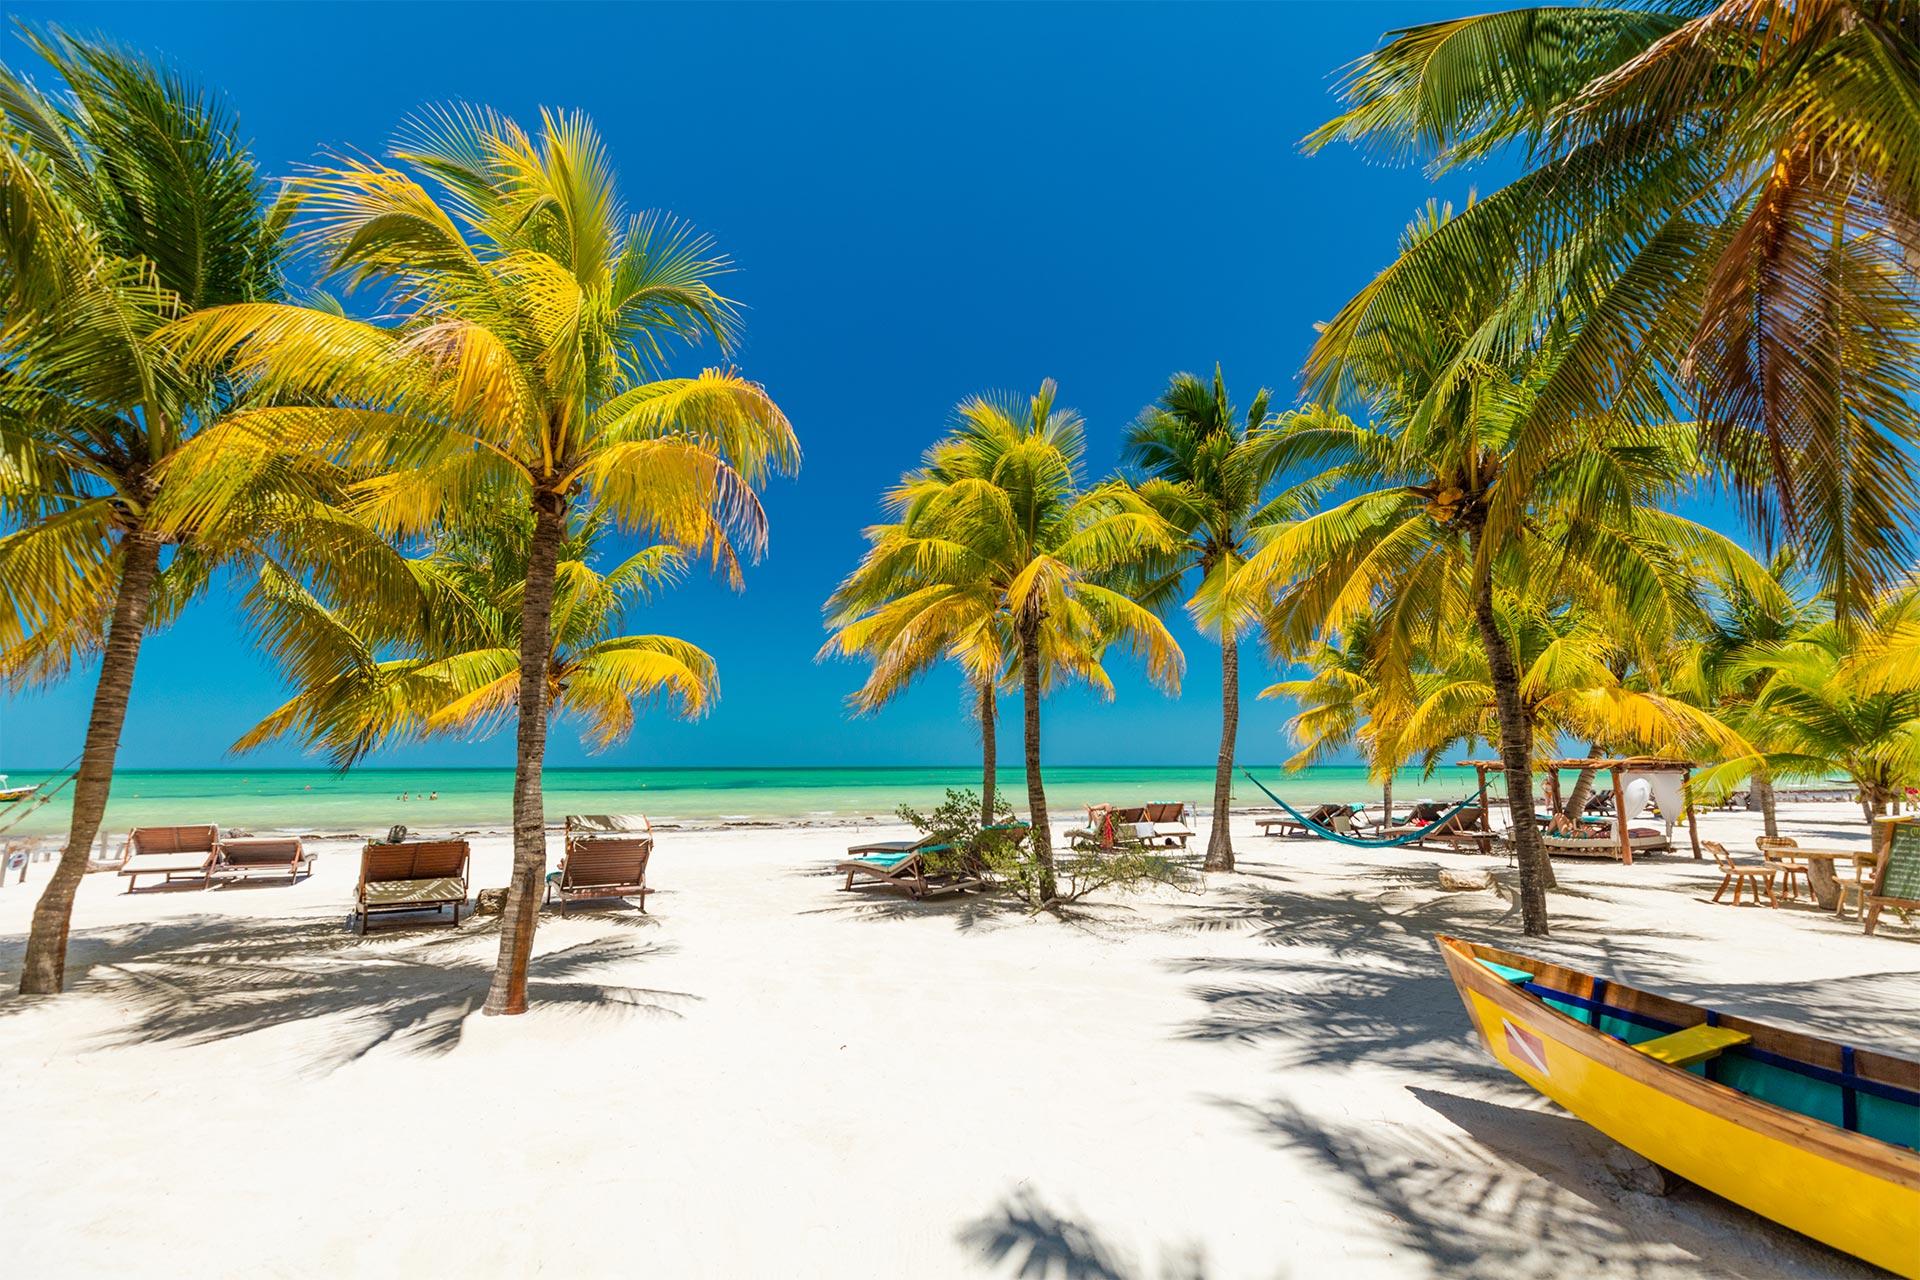 Sejur plaja Riviera Maya, Mexic, 9 zile - 13 ianuarie 2022